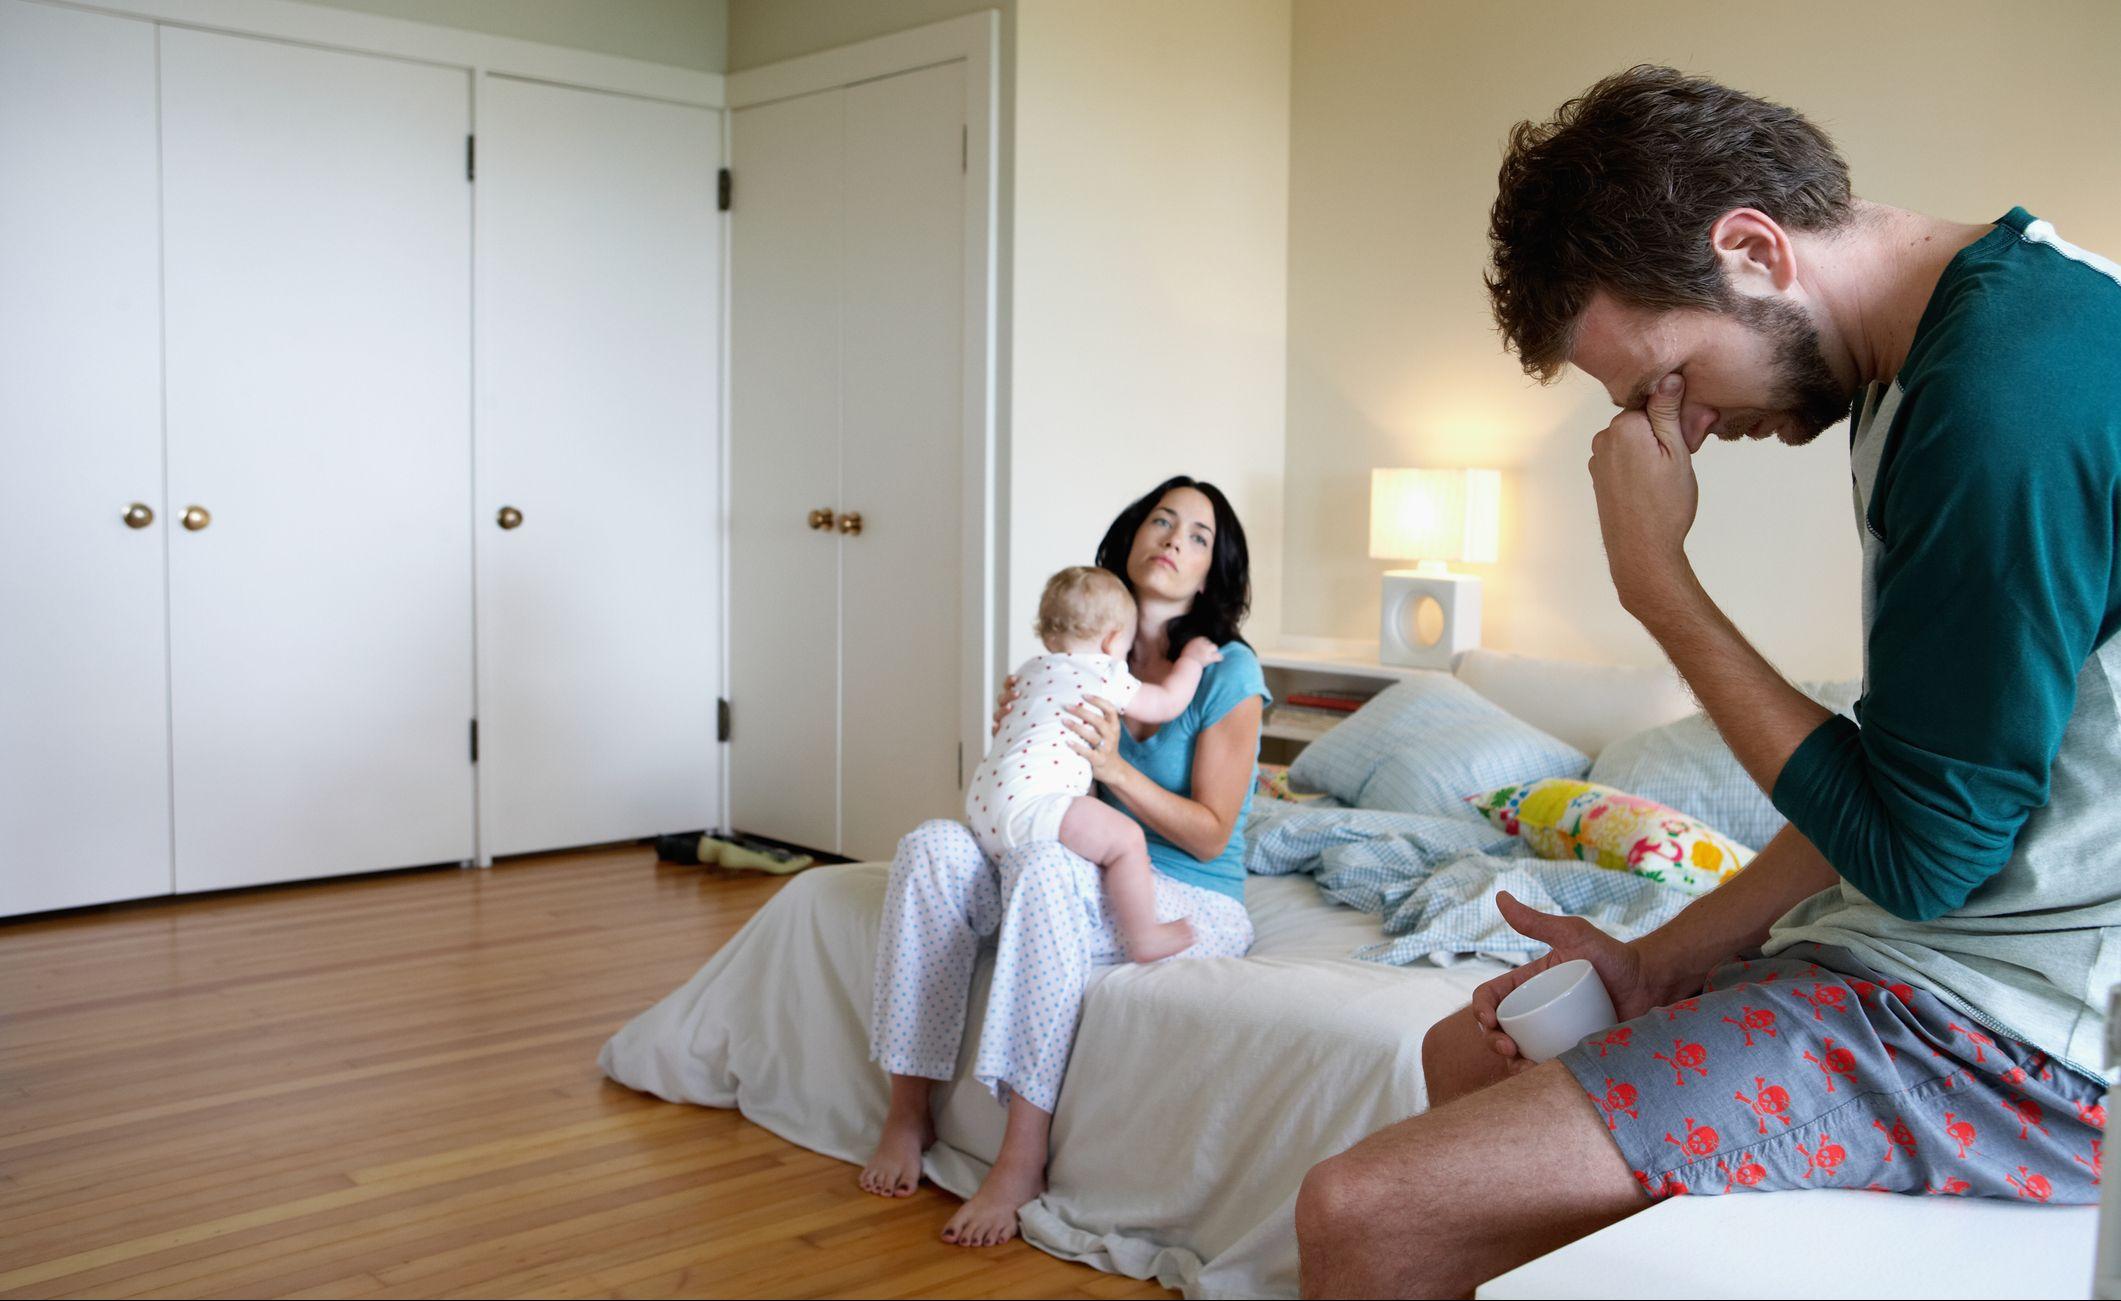 sex after pregnancy lack of sleep schedule sex